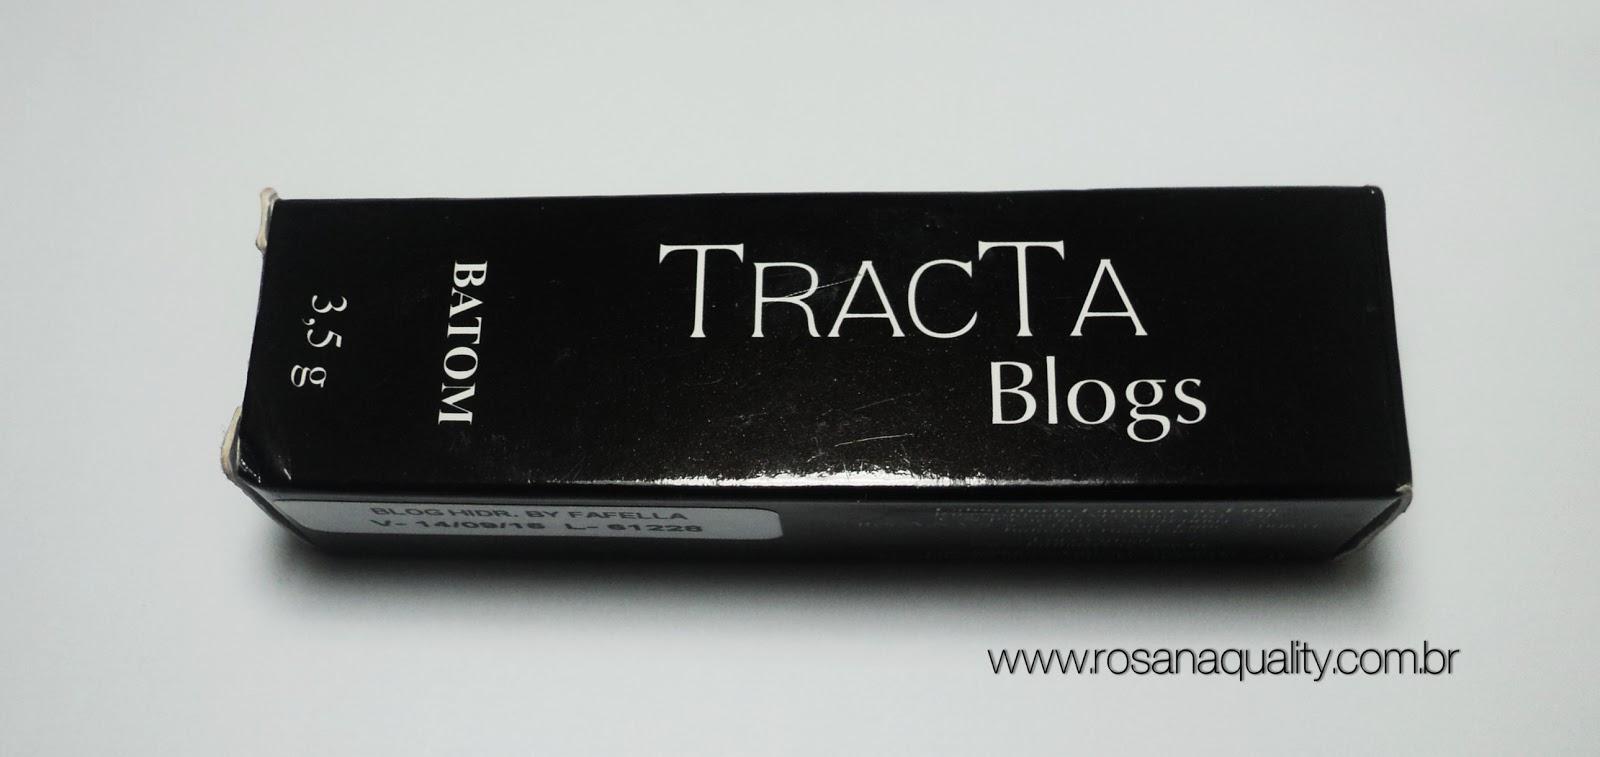 Batom by Fafella Tracta Momento Quality